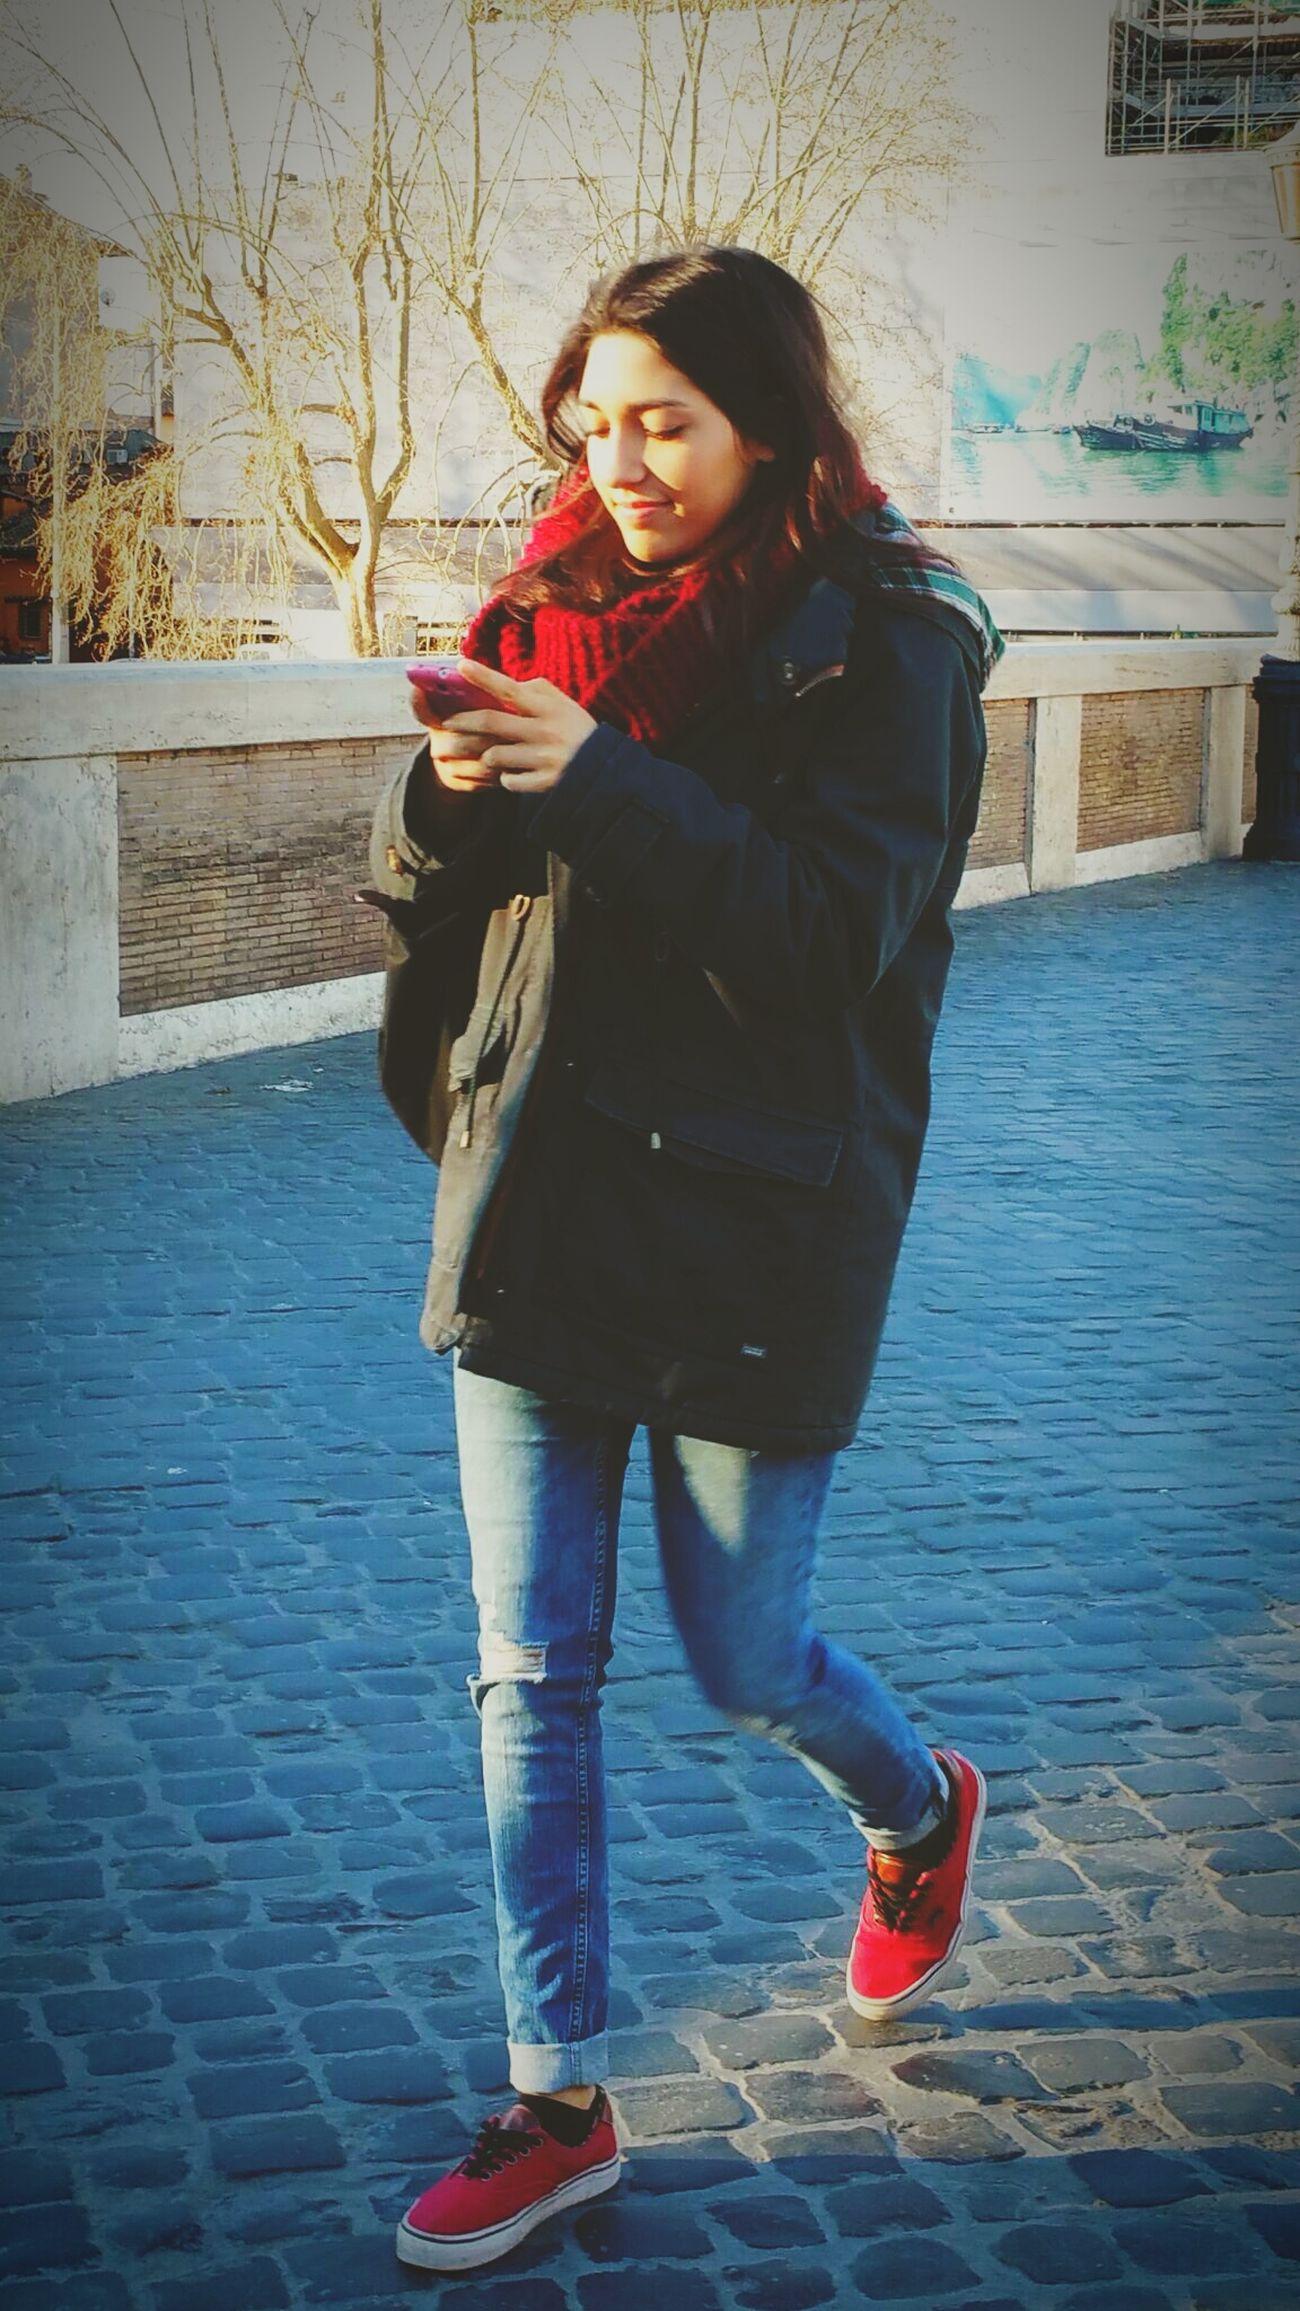 TwentySomething Rome,Italy. Hello World My Love Enjoying Life Portrait Of A Girl